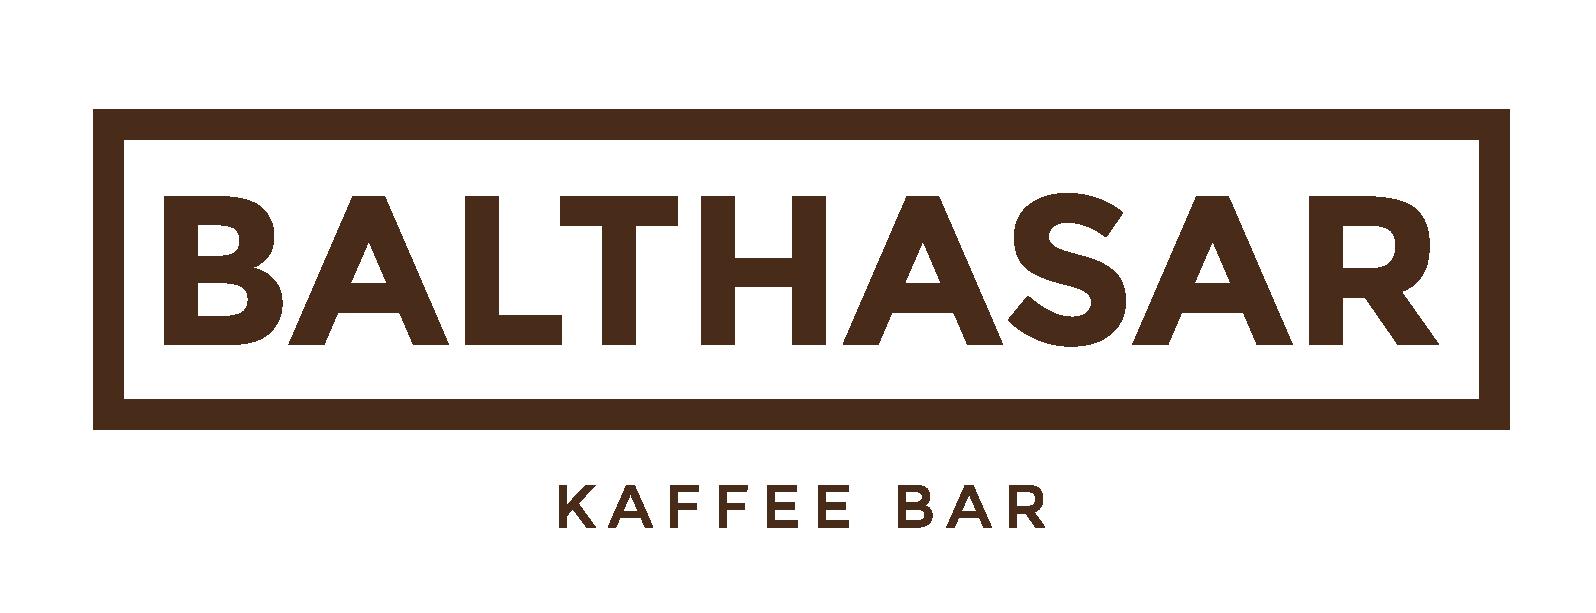 Balthasar Logo.png